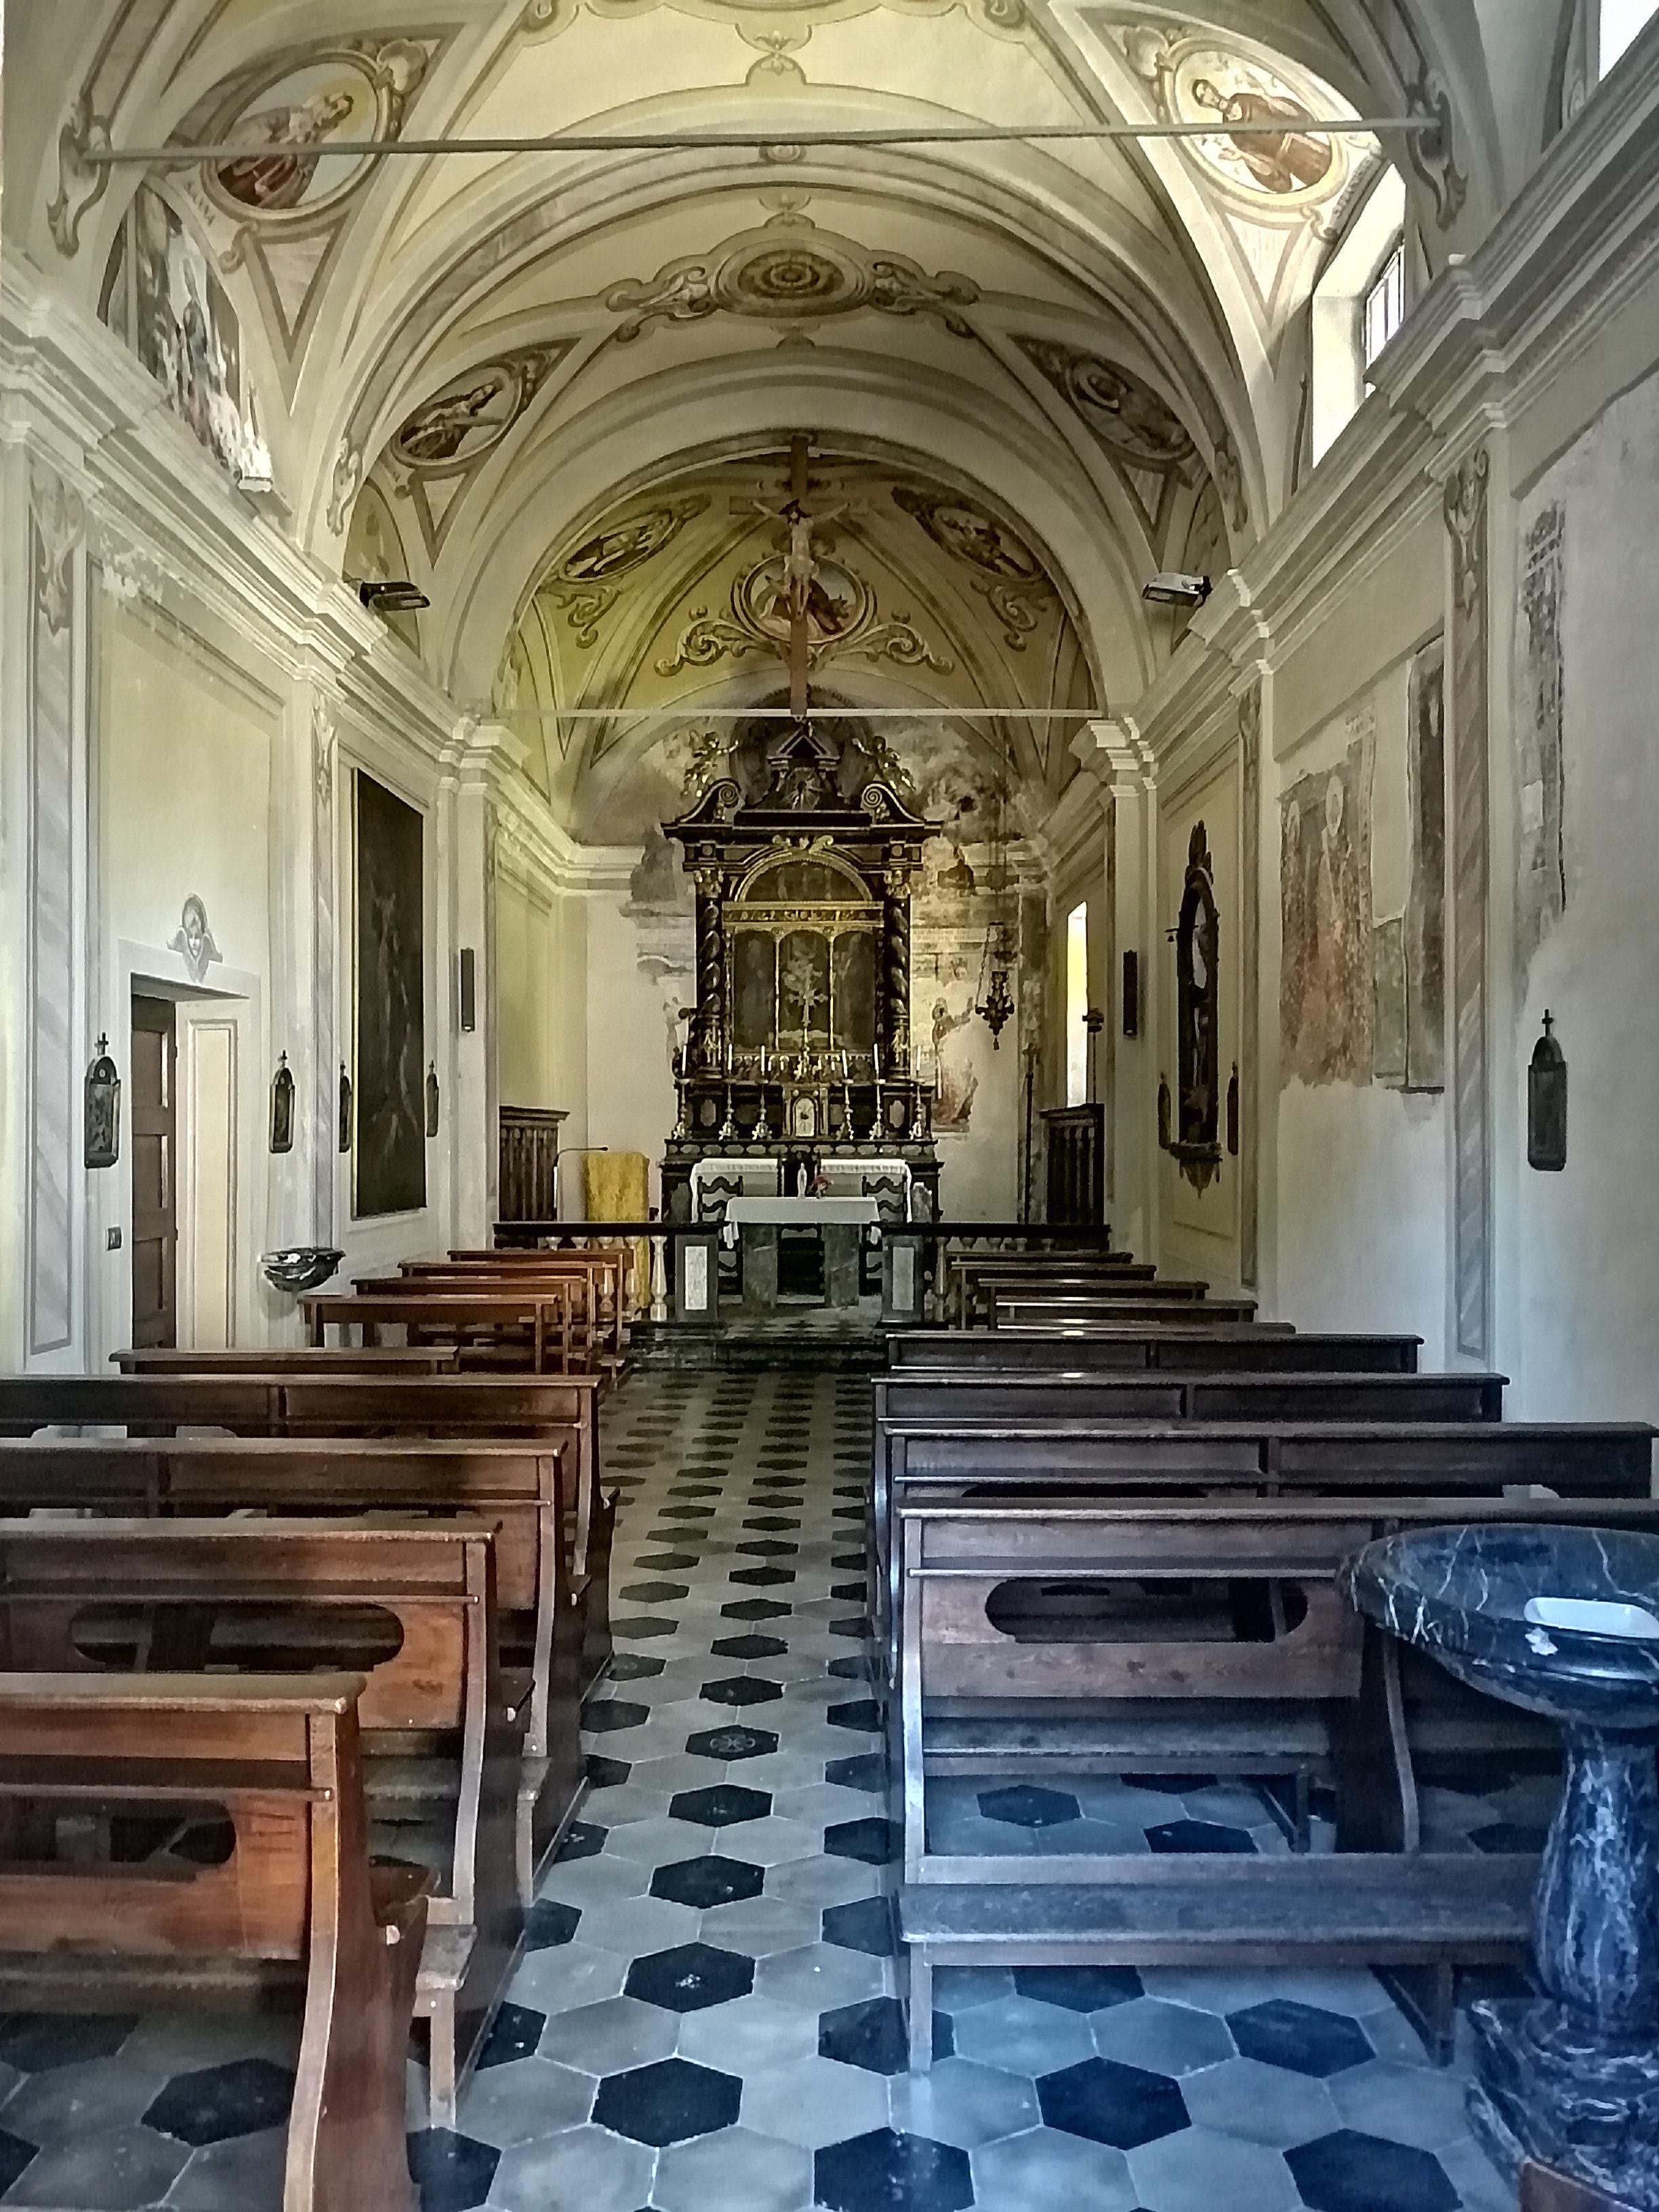 Chiesa di San Antonio Abate di Vezio